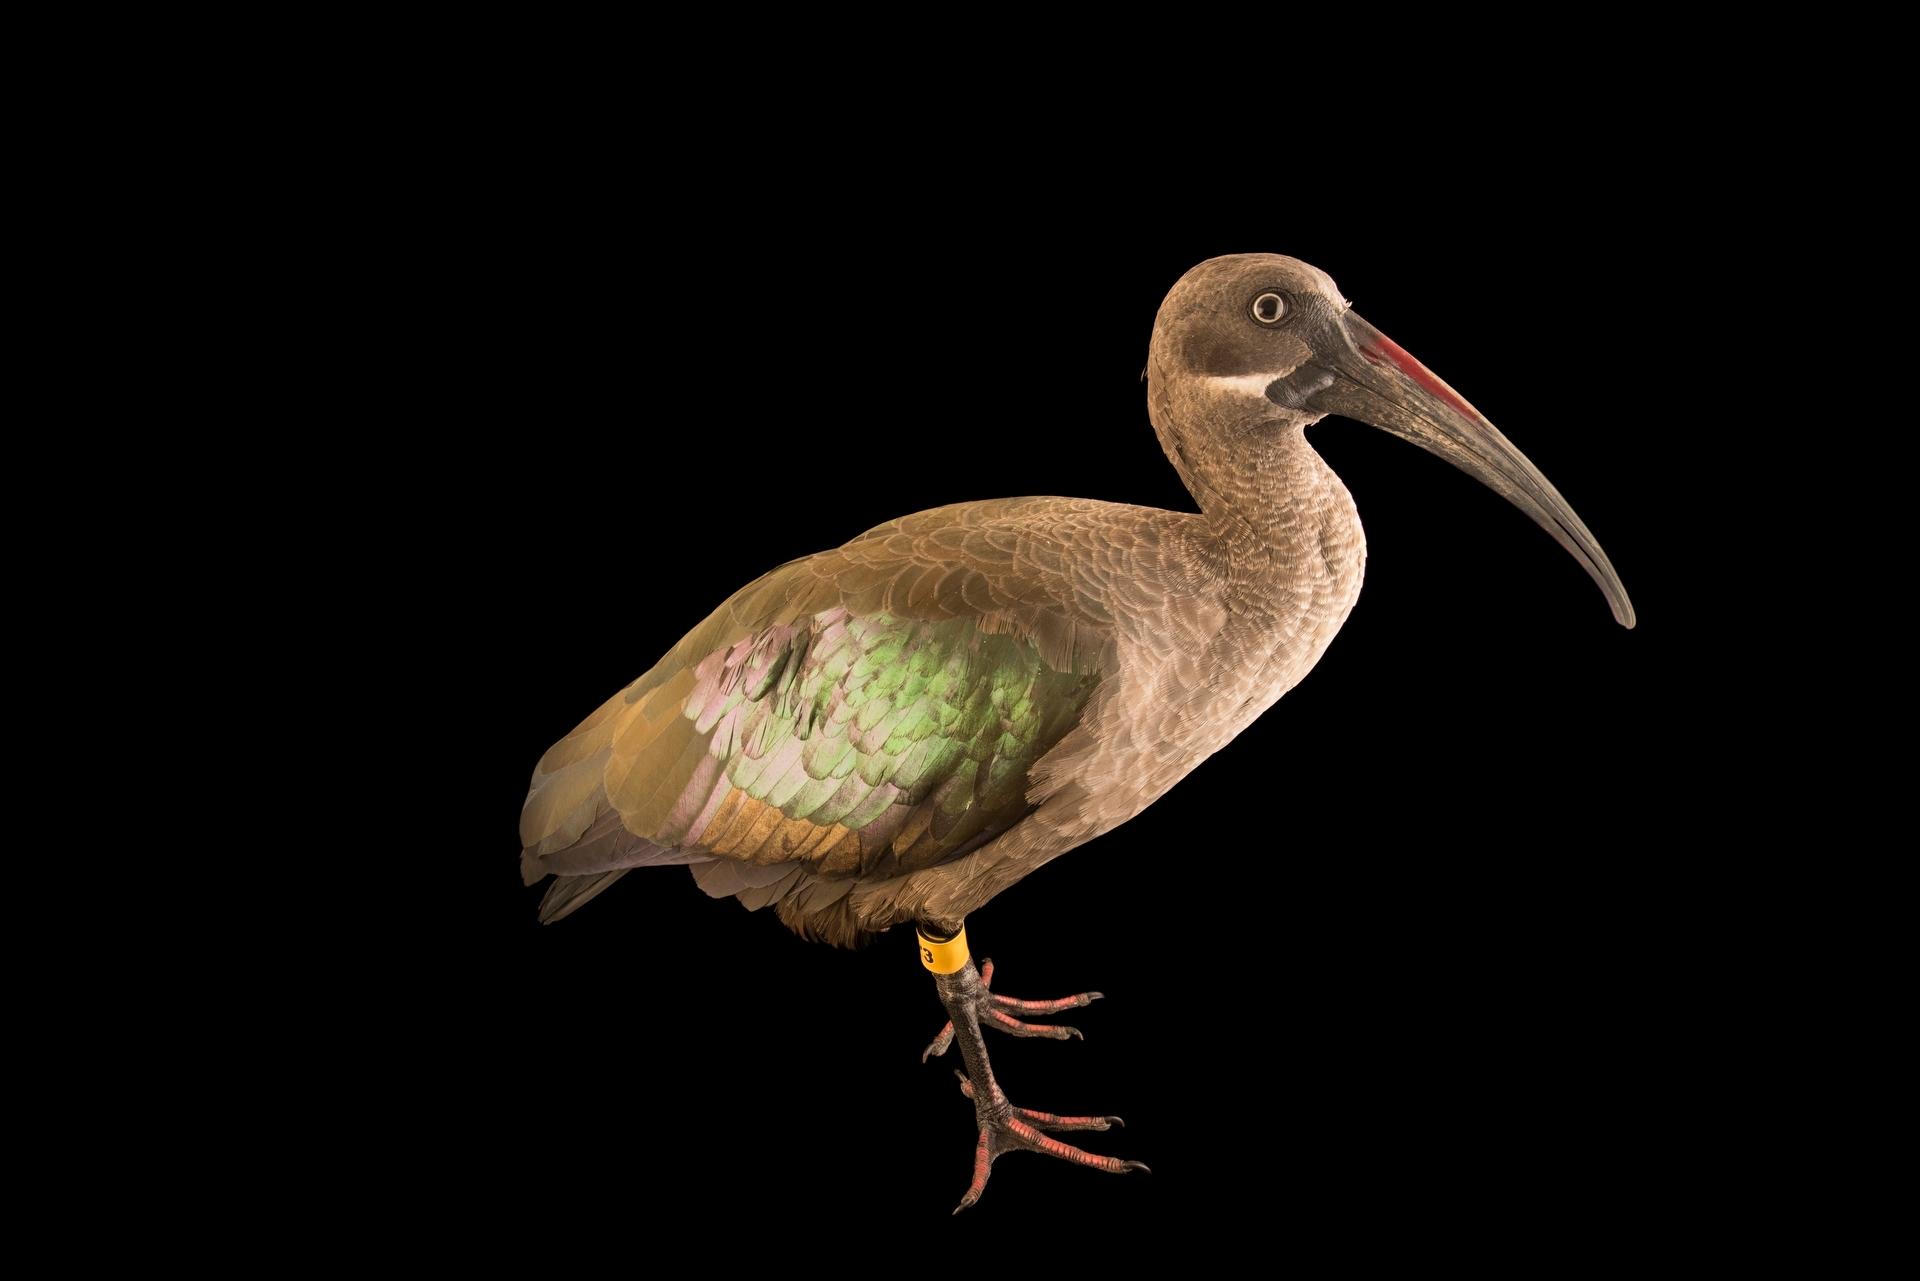 Photo: Hadada ibis (Bostrychia hagedash brevirostris) at the Dallas Zoo.